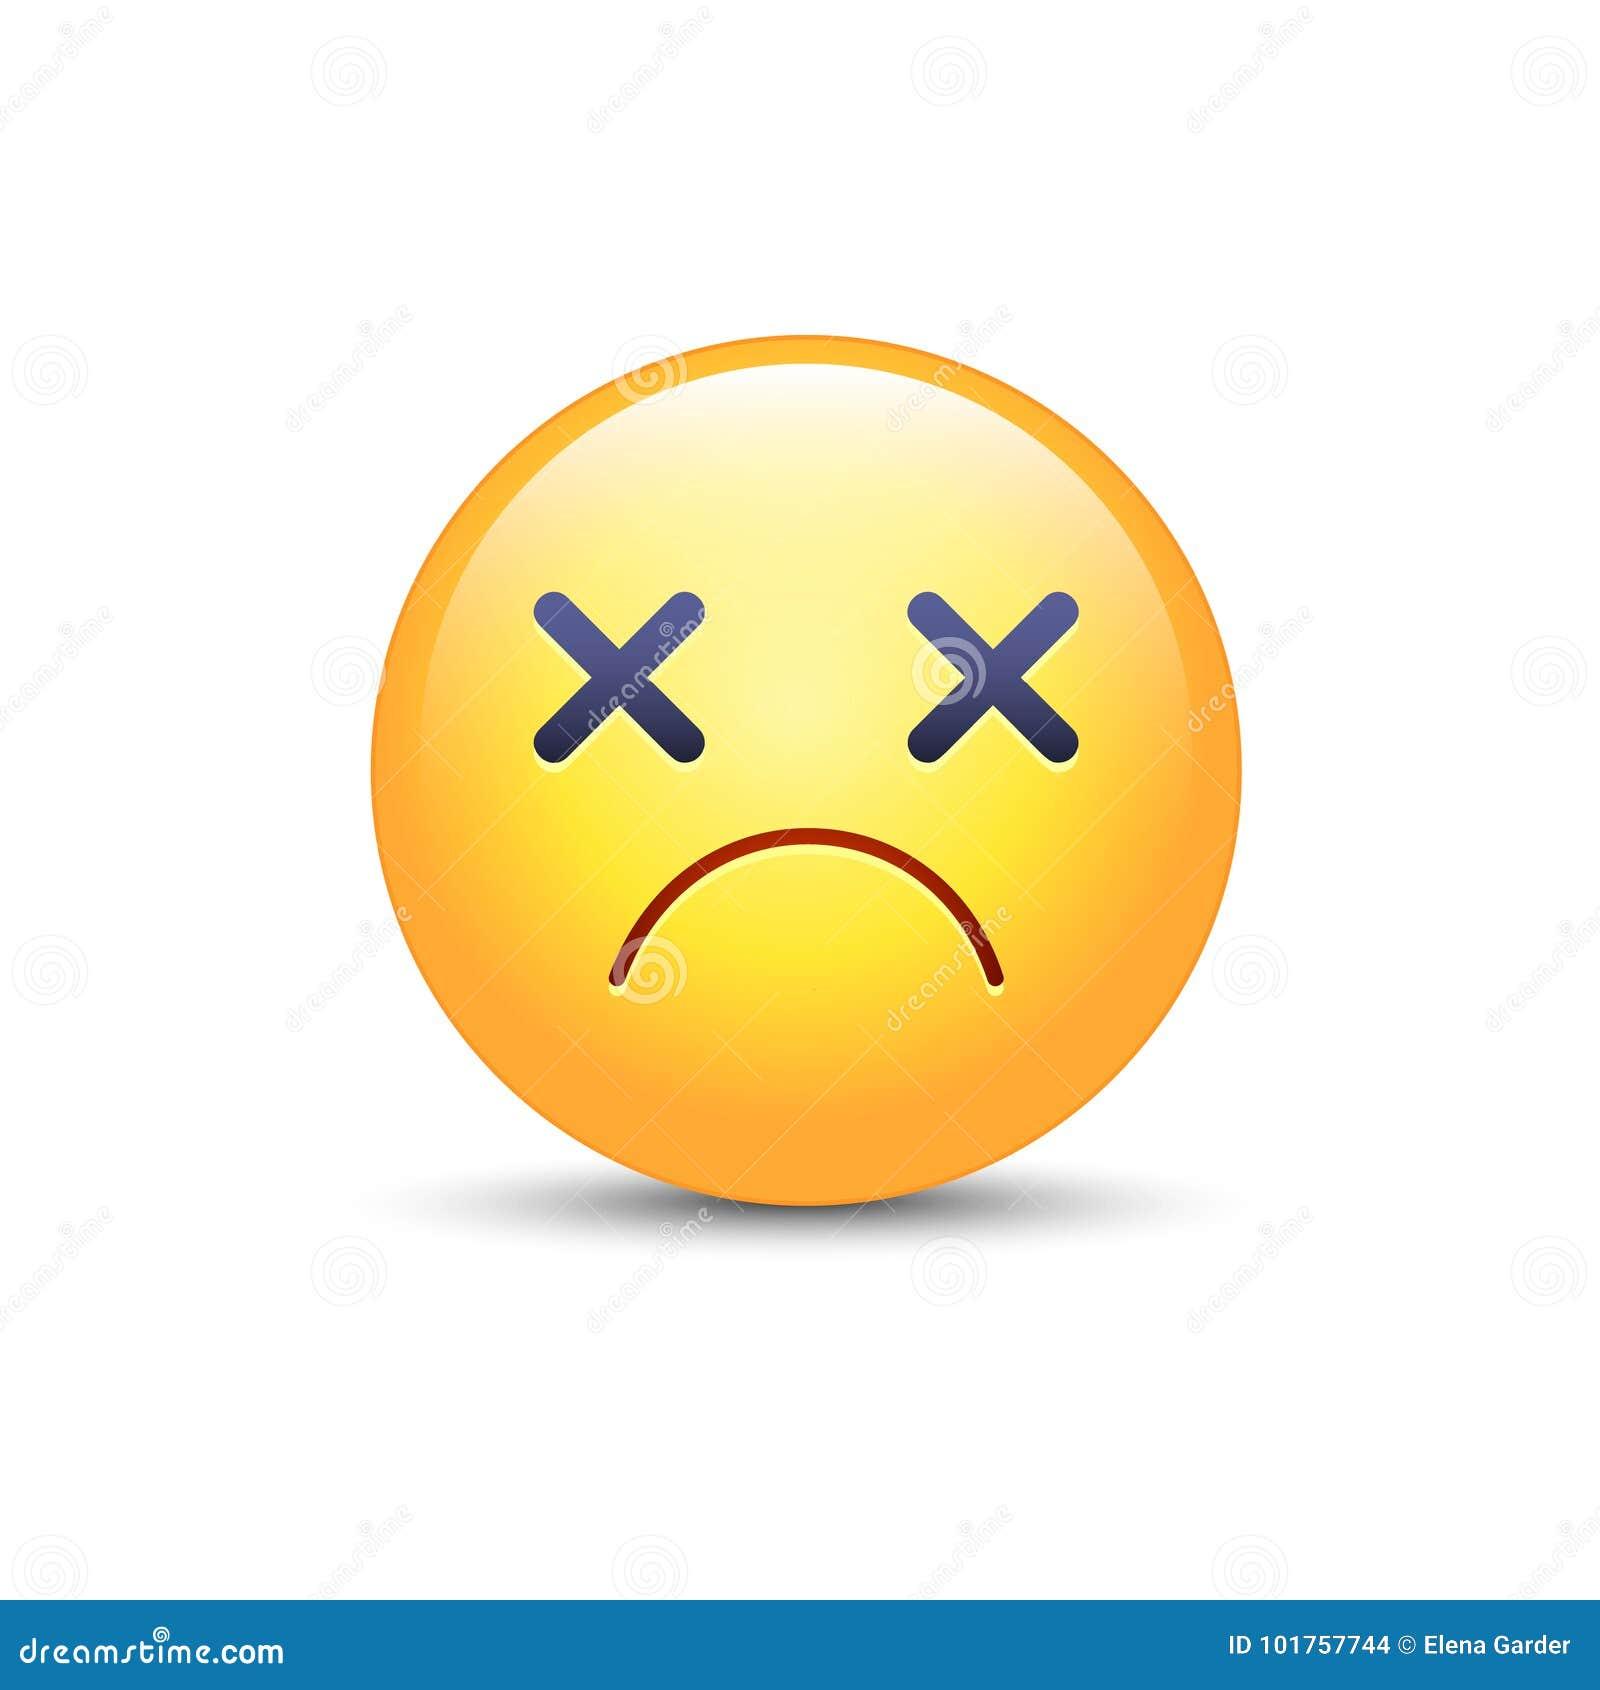 Dizzy emoji face cross eyes emoticon vector icon sad smiley dizzy emoji face cross eyes emoticon vector icon sad smiley vector illustration cartoondealer 101757744 buycottarizona Choice Image